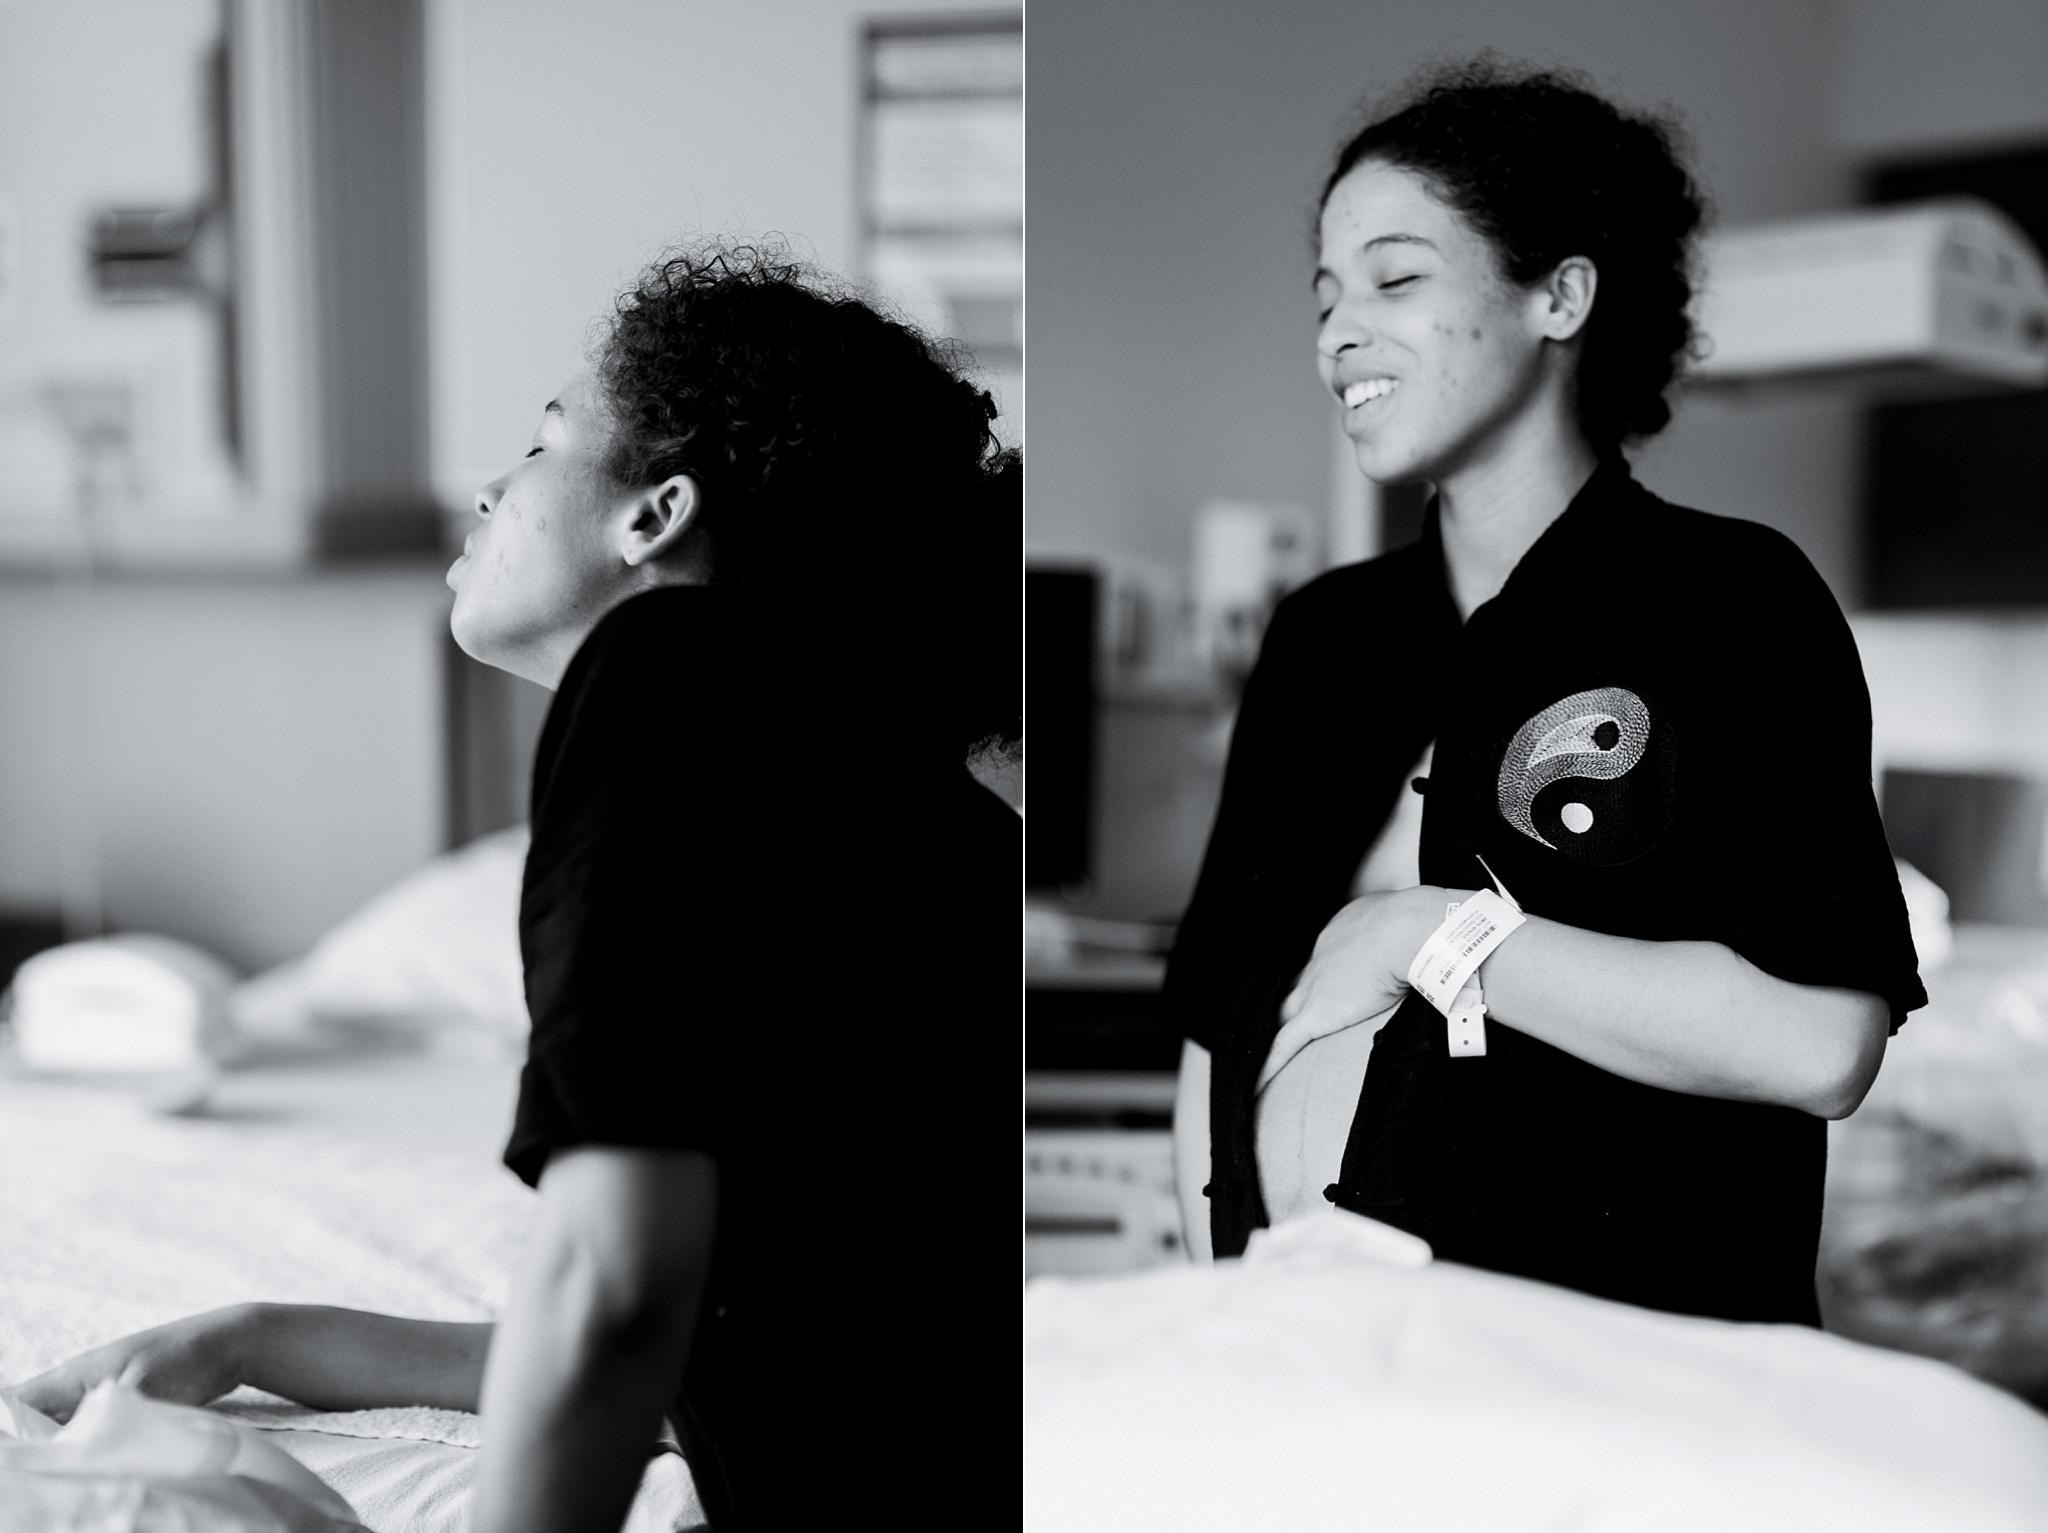 atlanta-medical-center-birth-photographer-nykole-smith-51.jpg